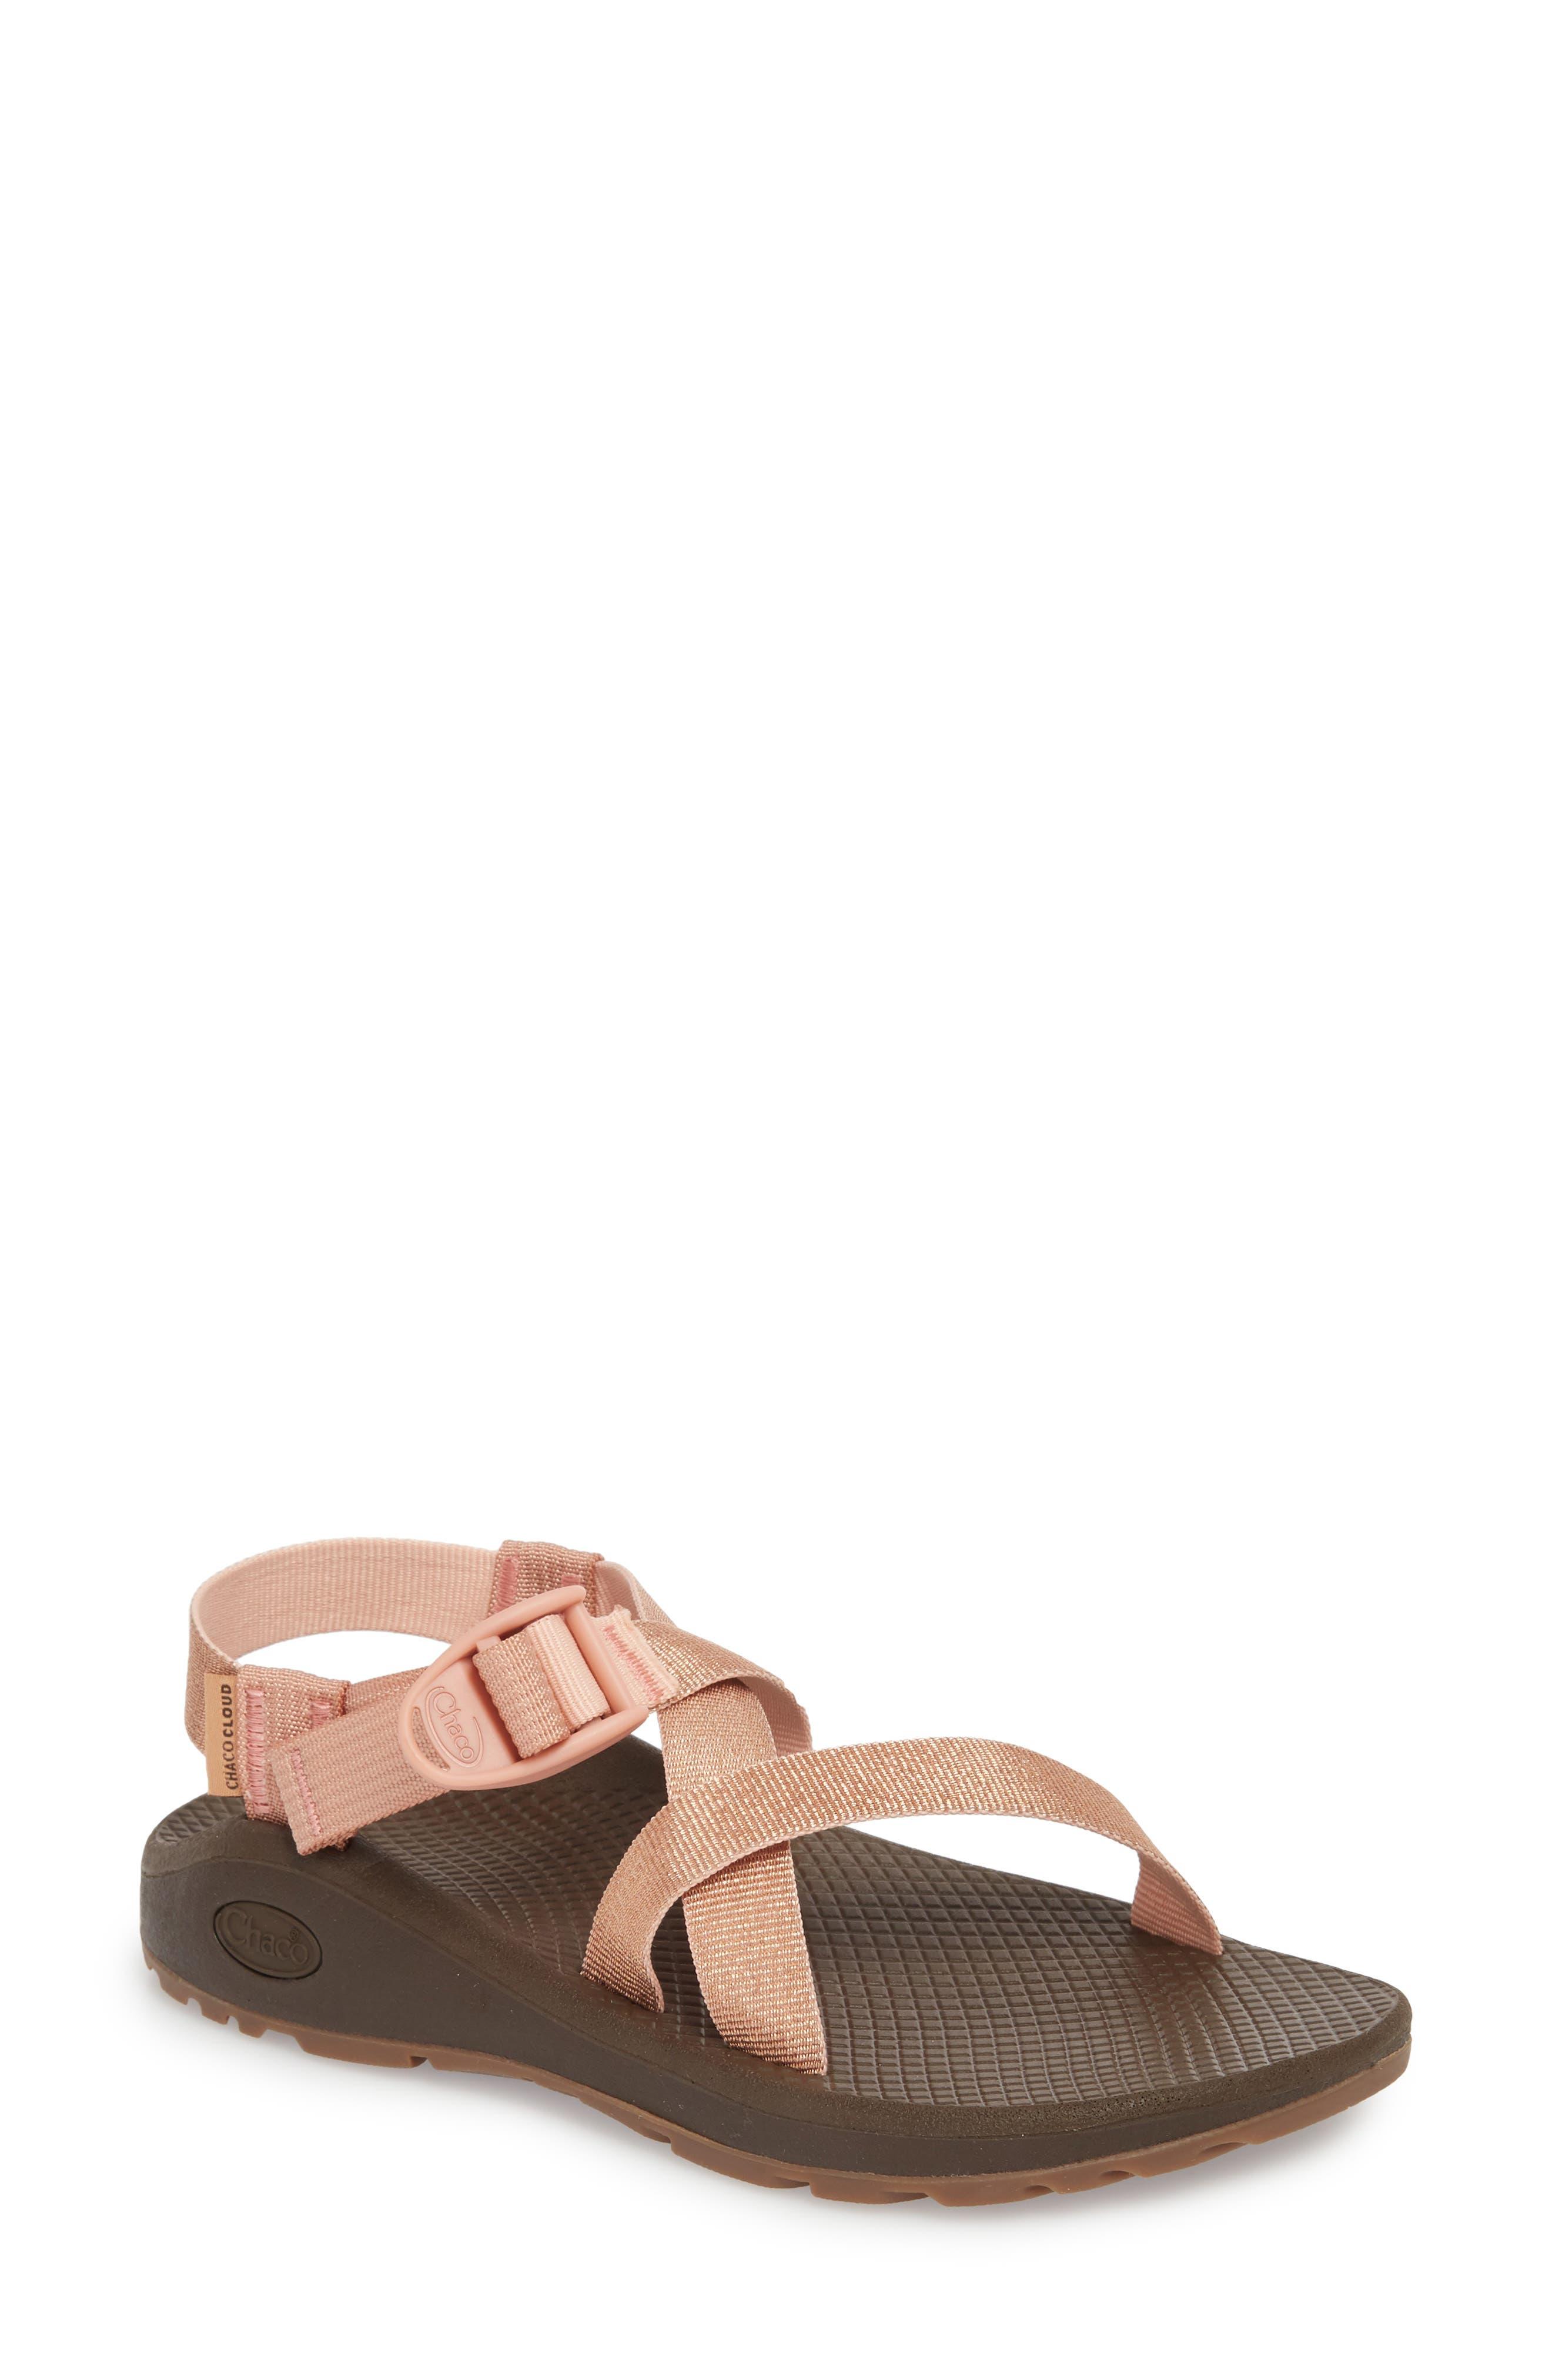 Z/Cloud Sandal,                             Main thumbnail 1, color,                             Metallic Rose Leather